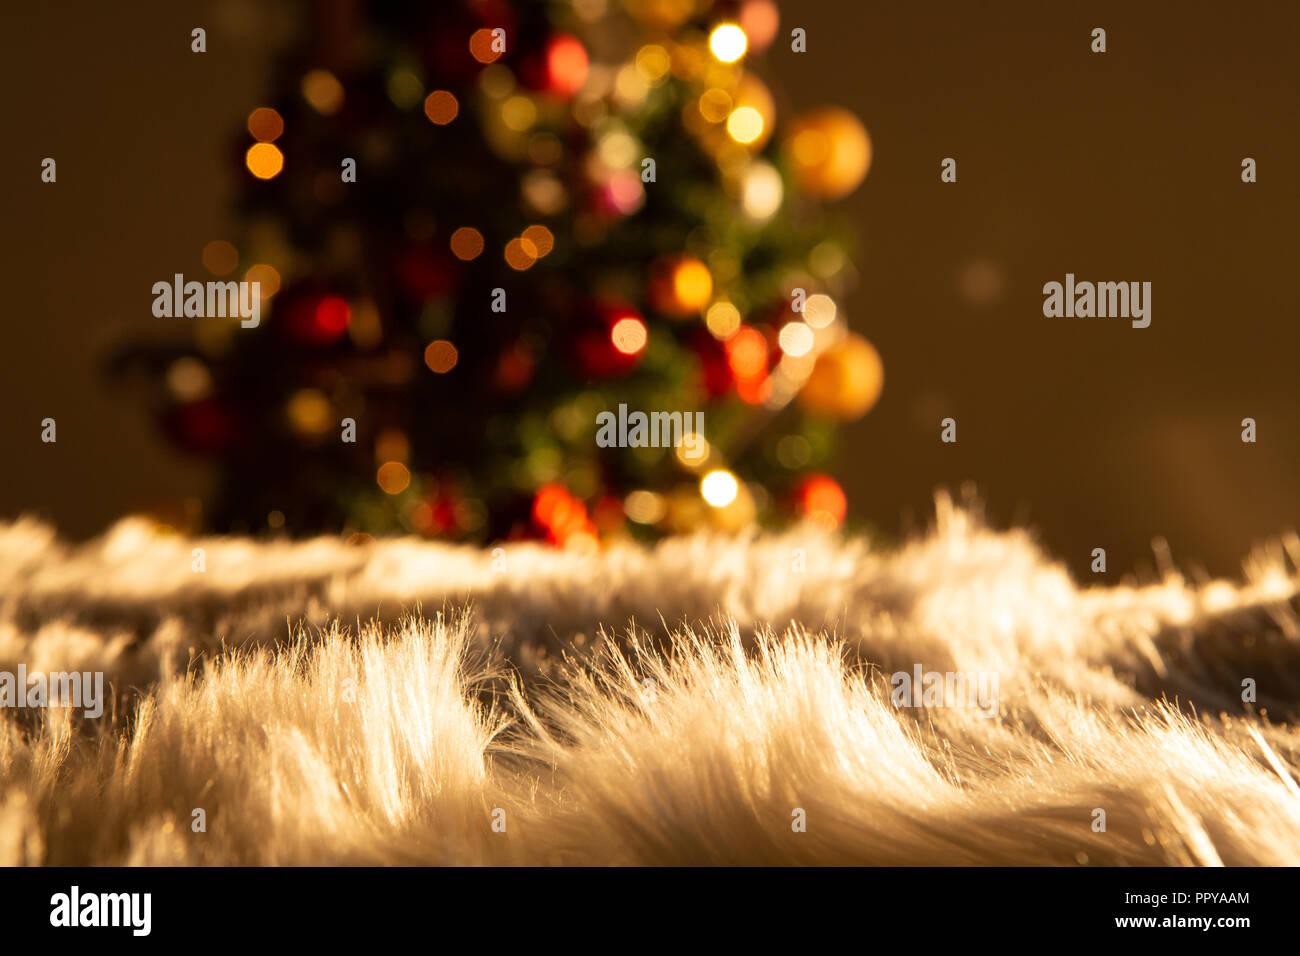 White carpet against unfocused decoration - Stock Image